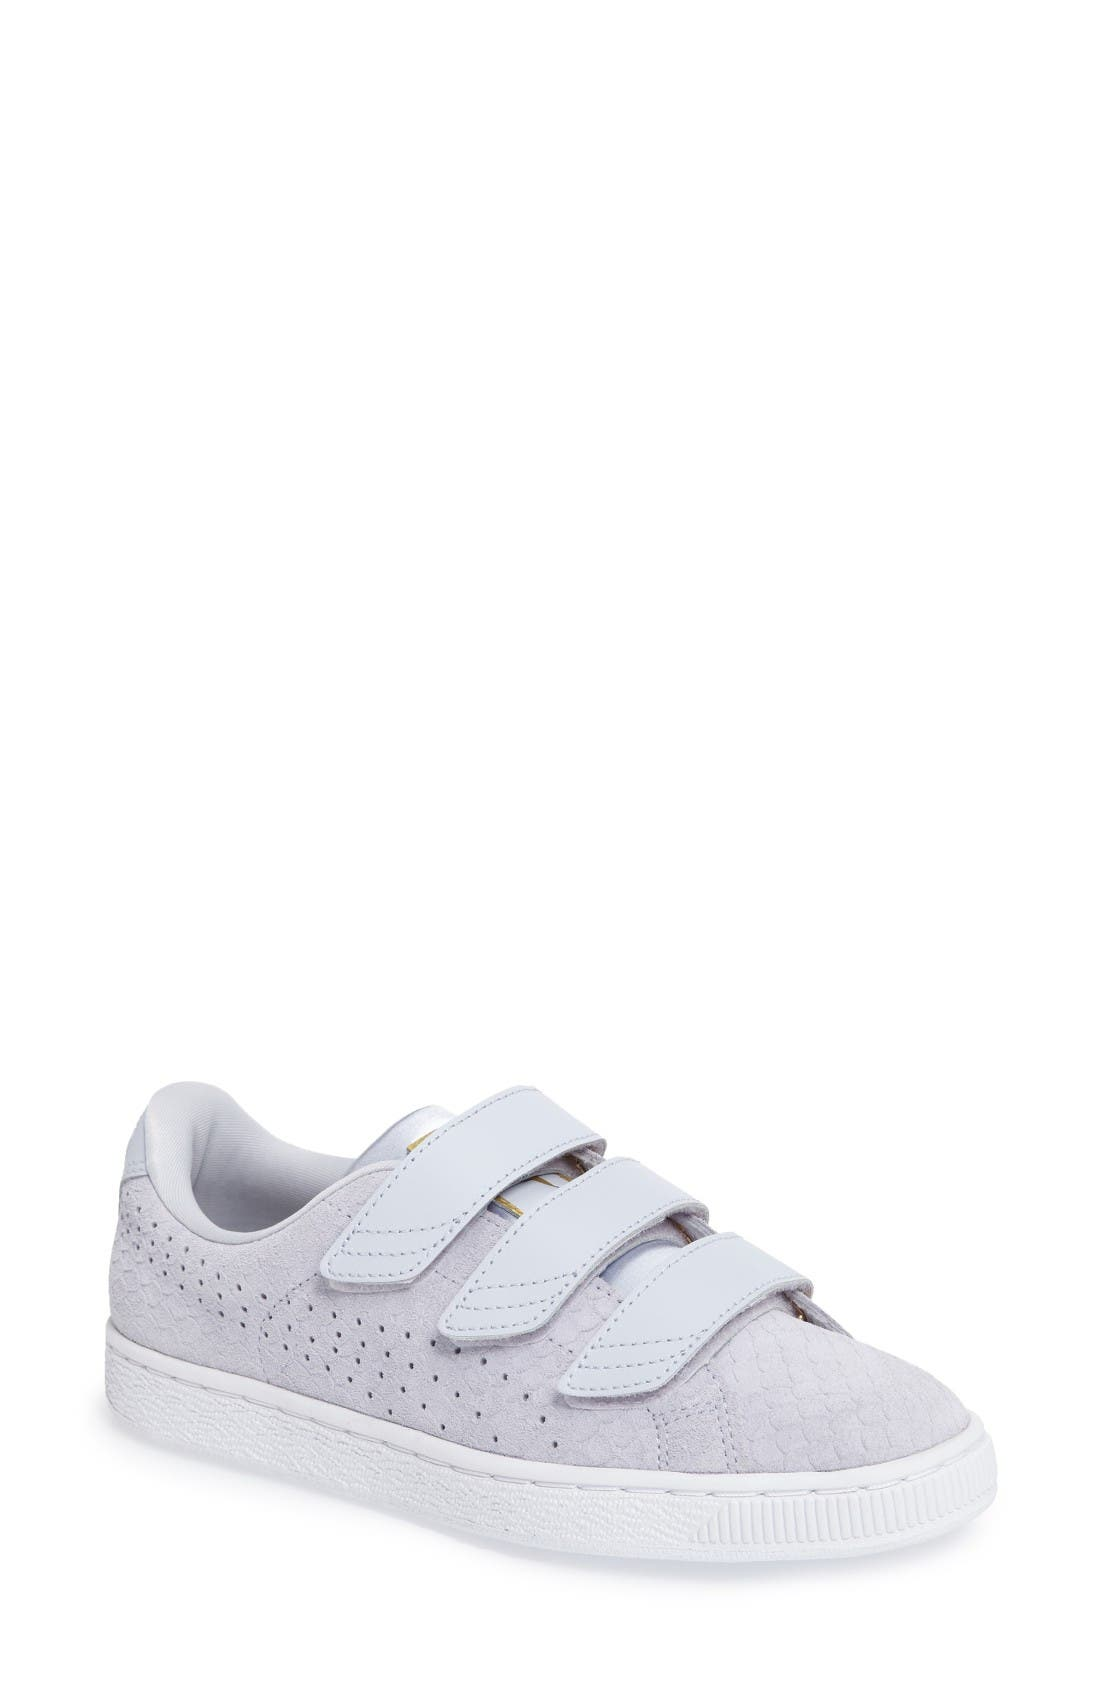 PUMA Basket Strap ExoticSkin Sneaker (Women)